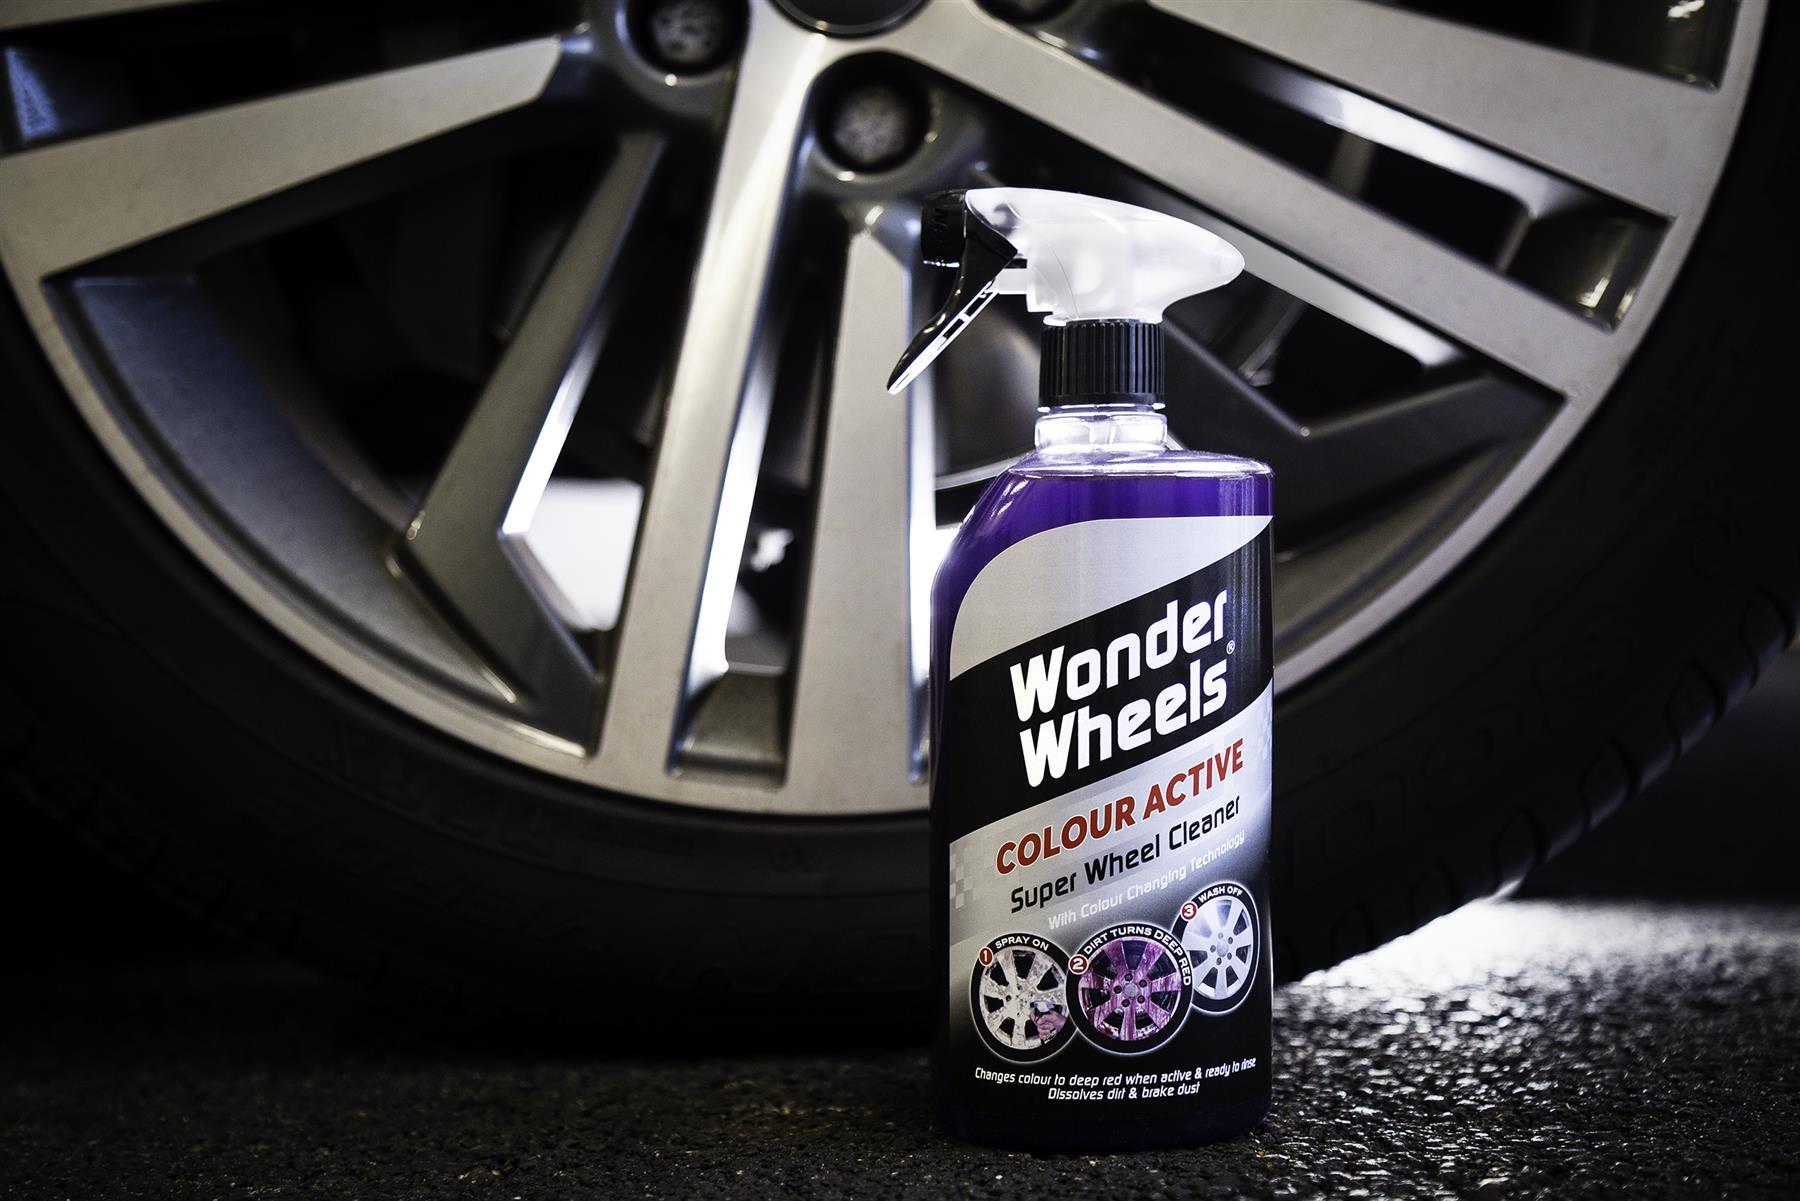 thumbnail 8 - Wonder-Wheels-Colour-Active-Super-Car-Wheel-Cleaner